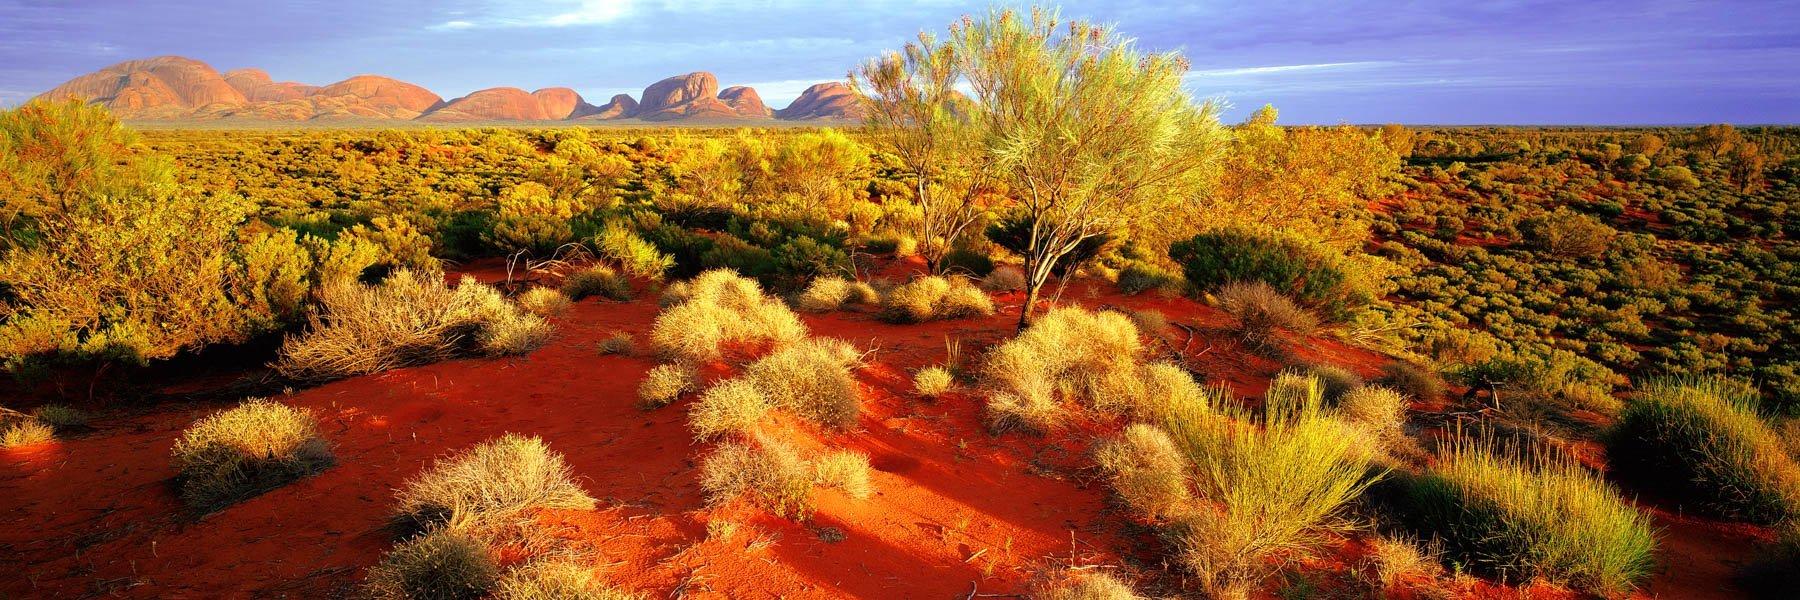 View across the desert to Kata Tjuta, NT, Australia.